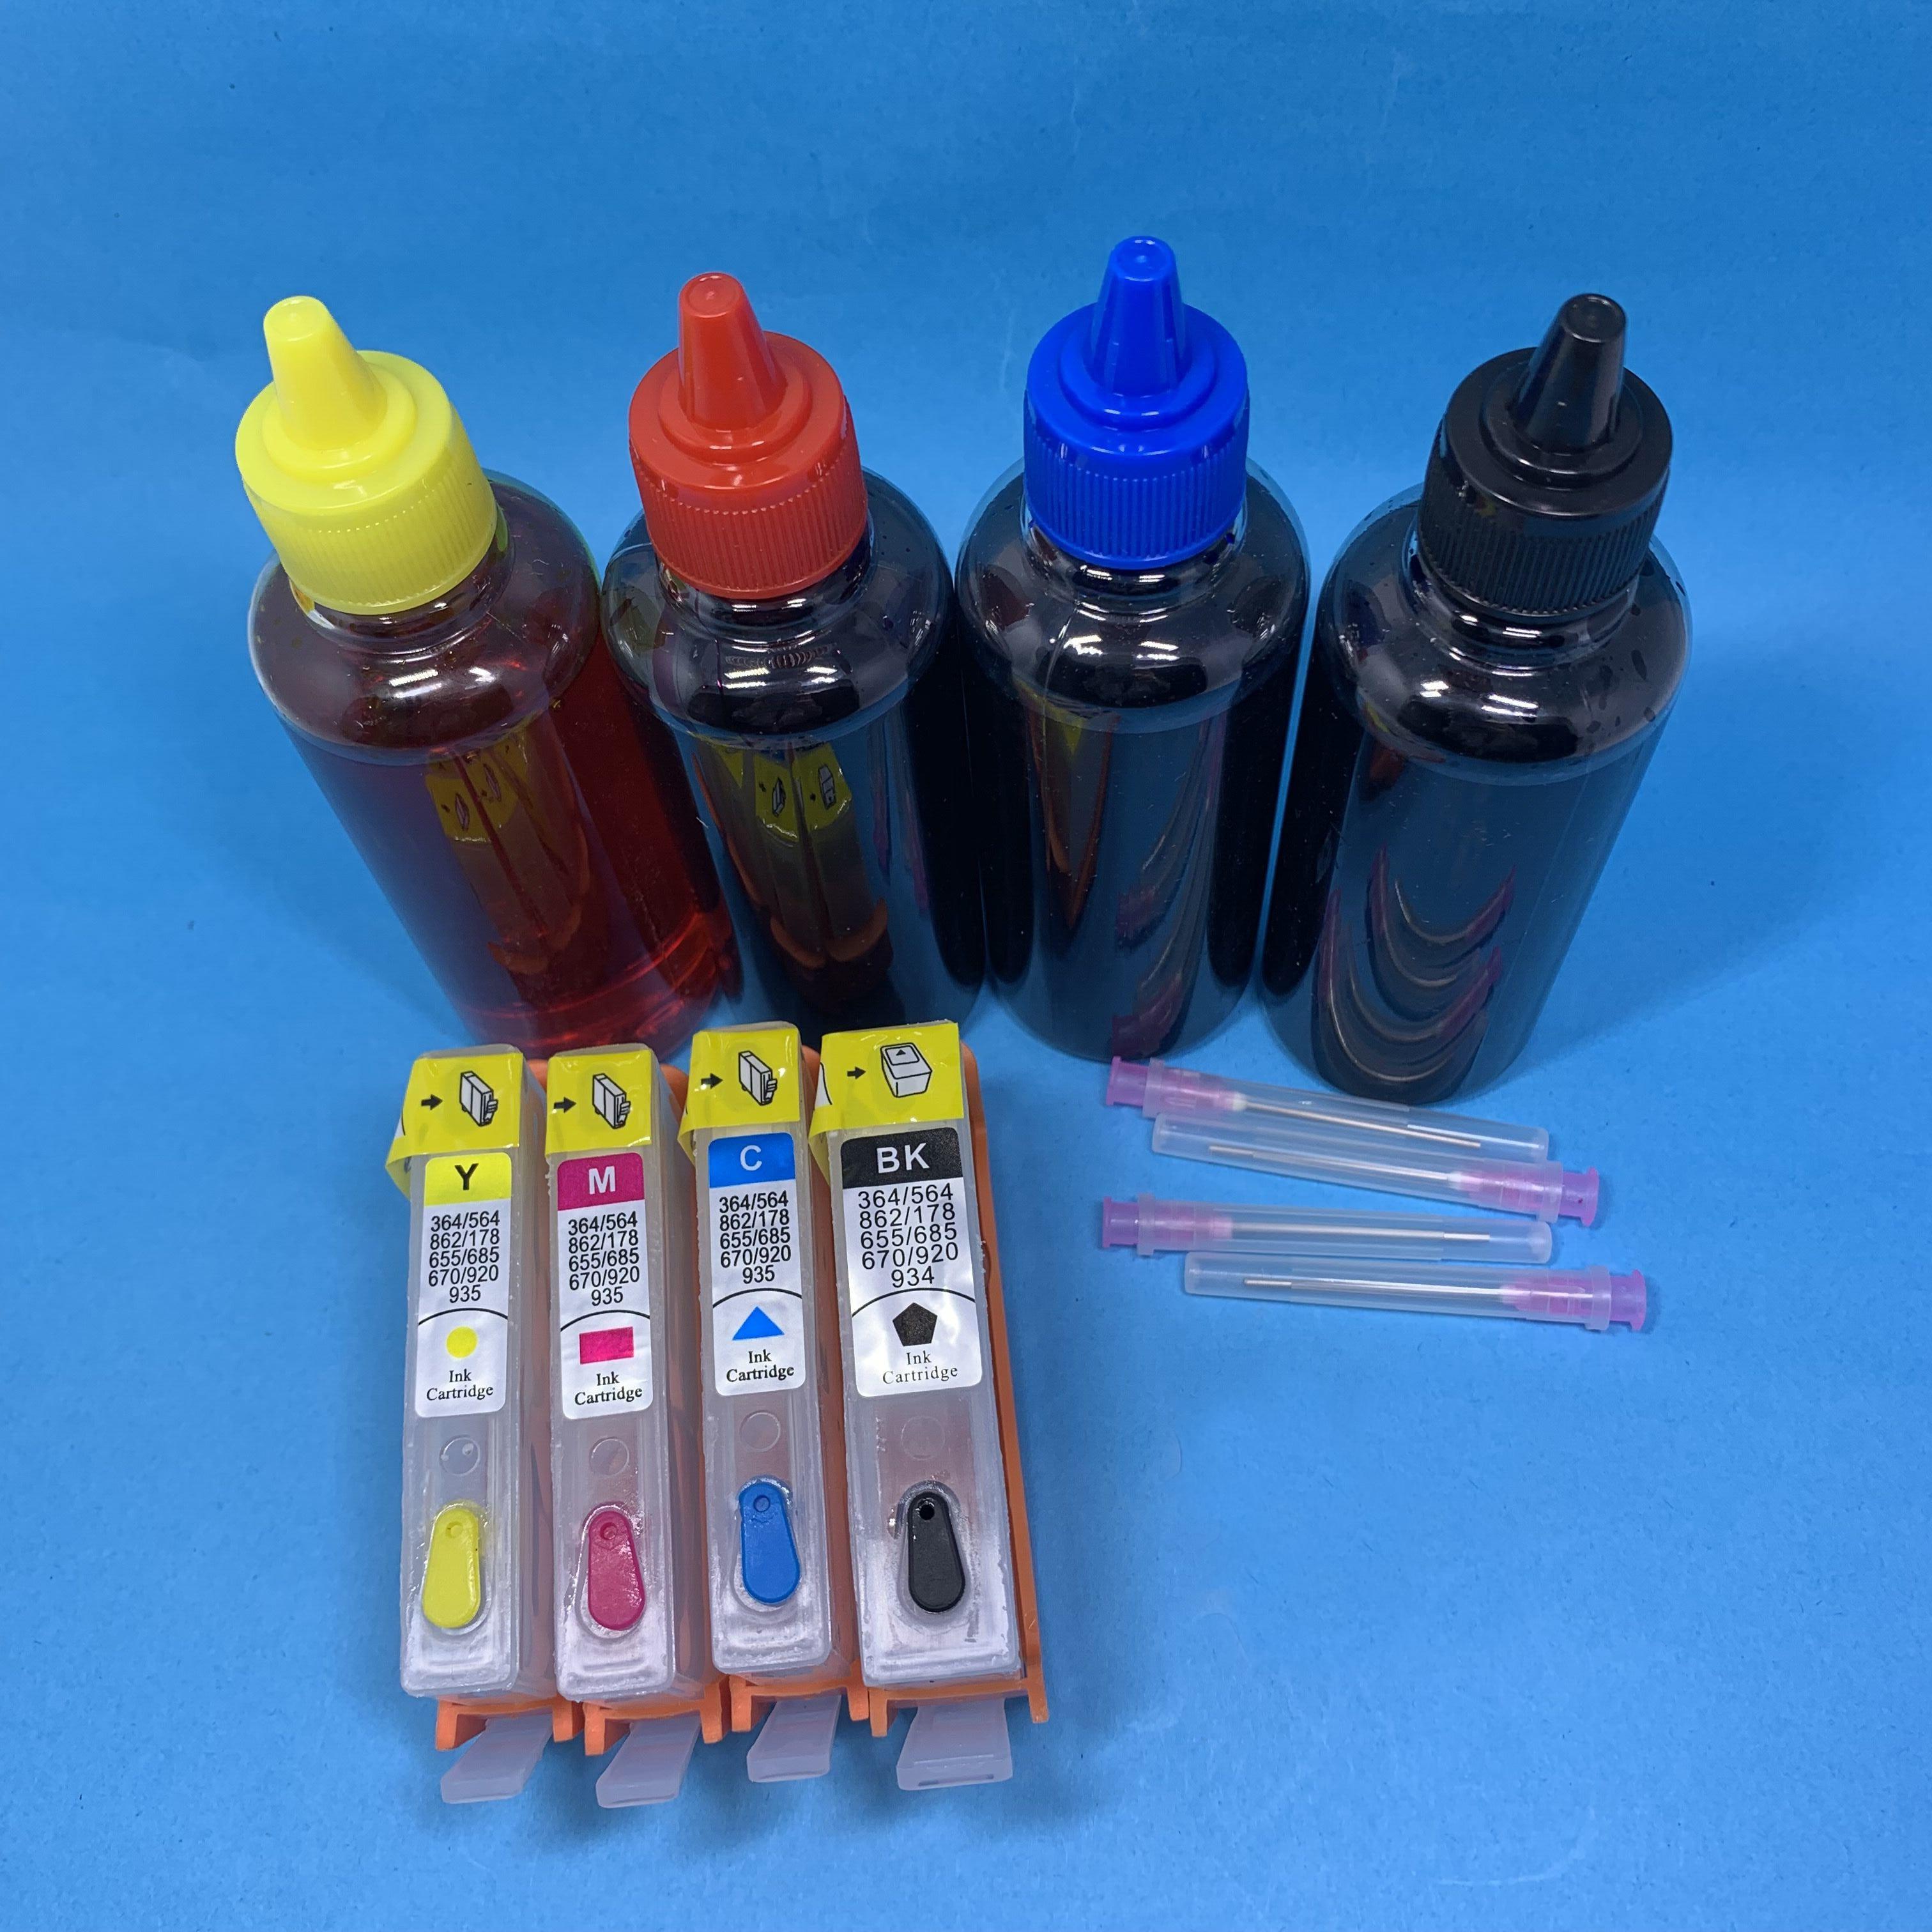 Yotat 4*100ml tinta corante + recarregáveis para hp920 cartucho de tinta para hp 920 para hp920xl officejet 6000 6500a 7000 7500 7500a impressora